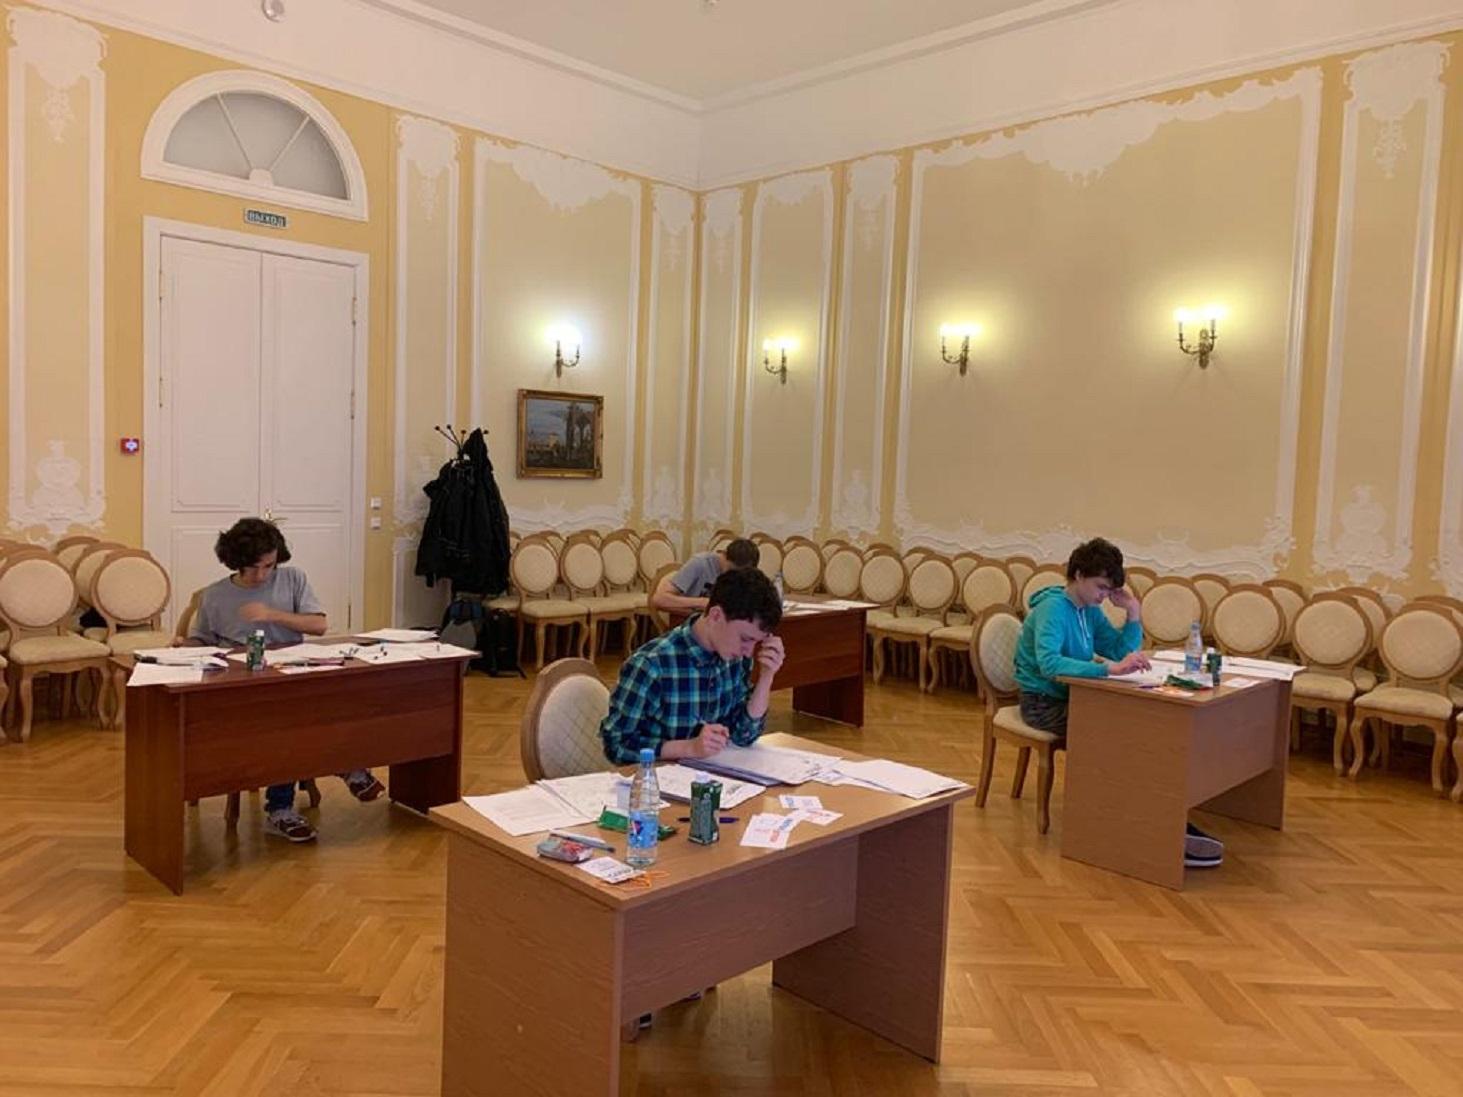 rossijskie-shkolniki-zanyali-pervoe-mesto-na-olimpiade-po-matematike